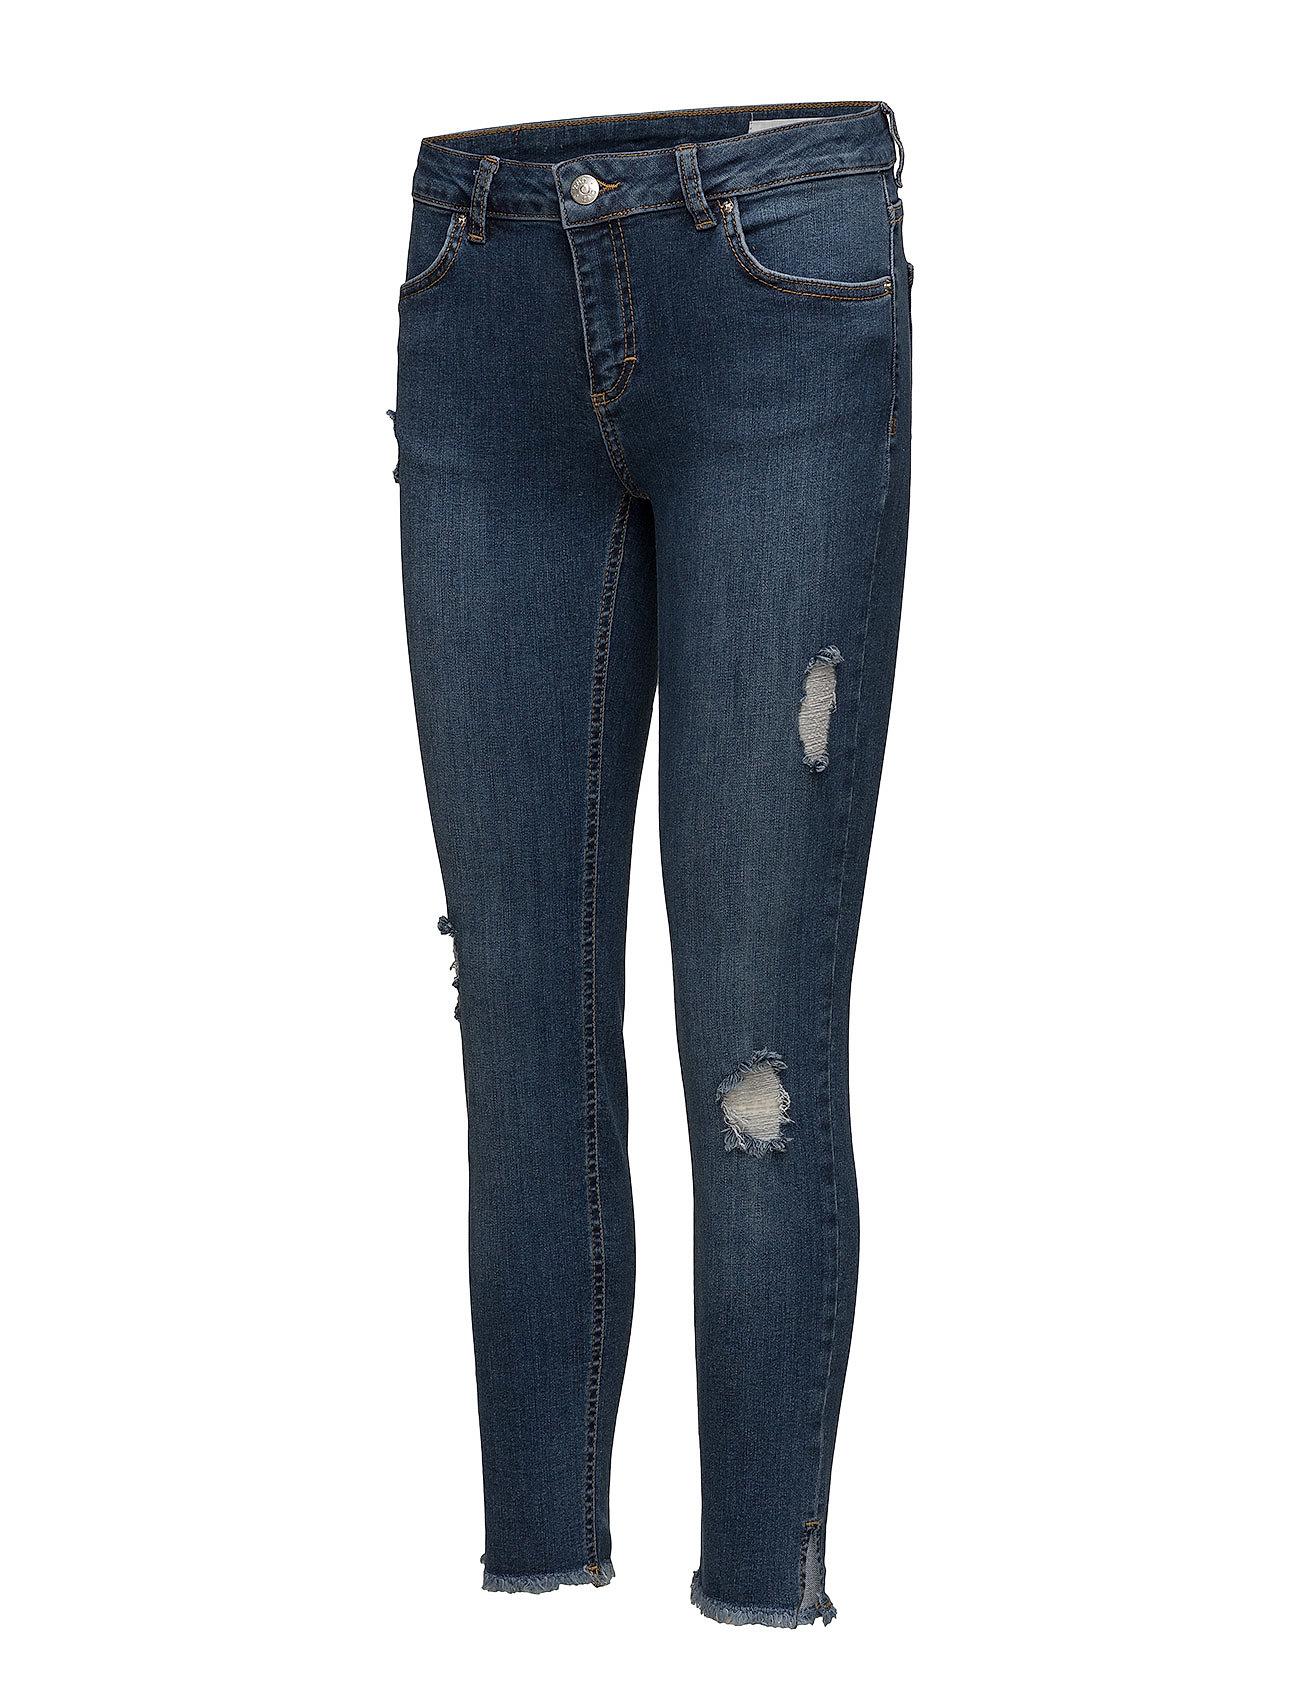 2nd One Nicole 893 Crop  Jeans (Raw Indigo Flex Split), 309